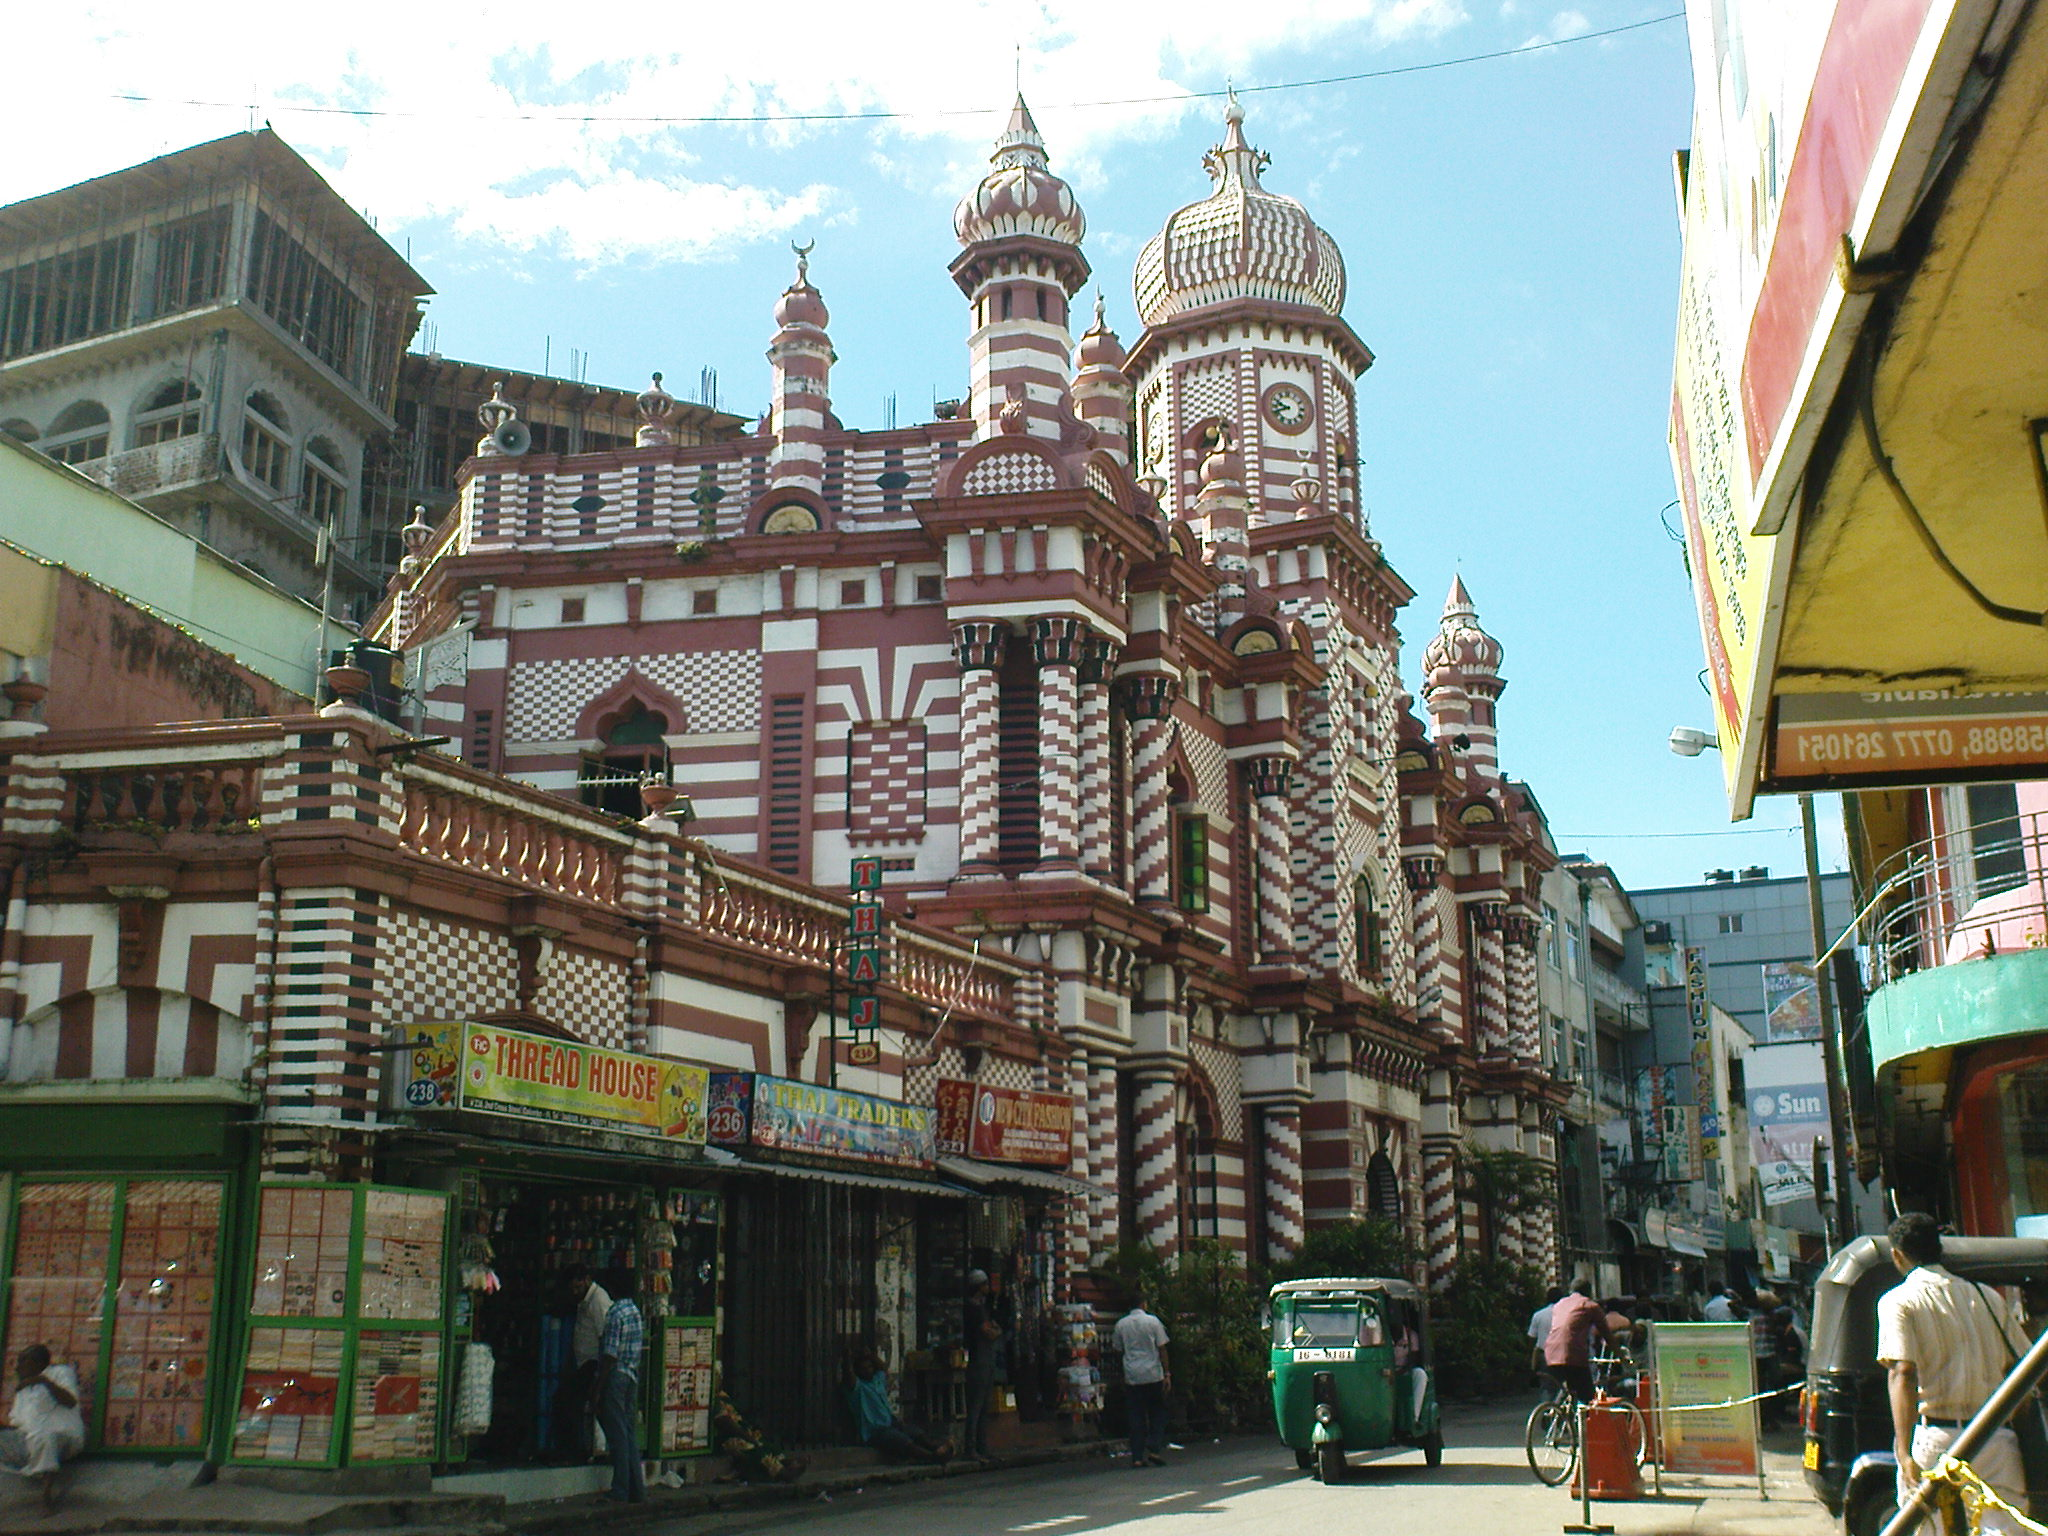 Colombo Sri Lanka  city photos : Description Beautiful Landmark Muslim Mosque in Colombo, Sri Lanka